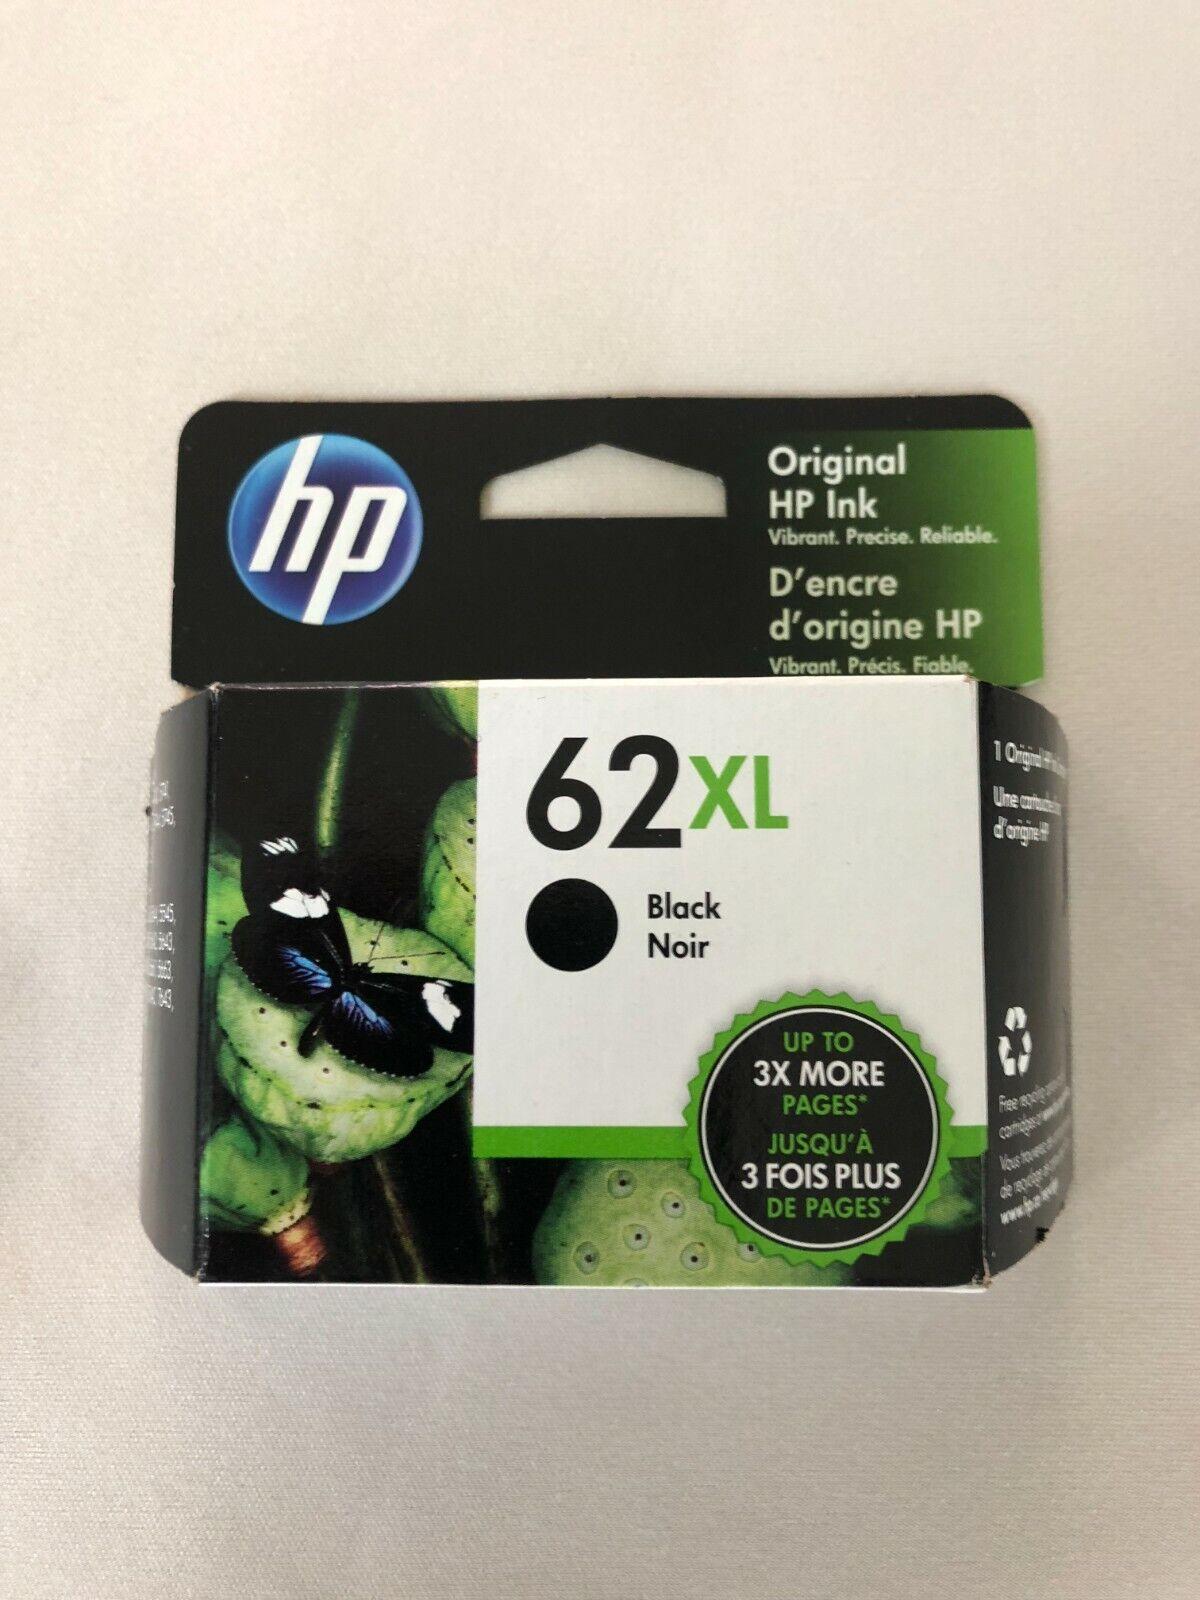 HP 62XL Printer Ink Cartridge Black New in Box OEM